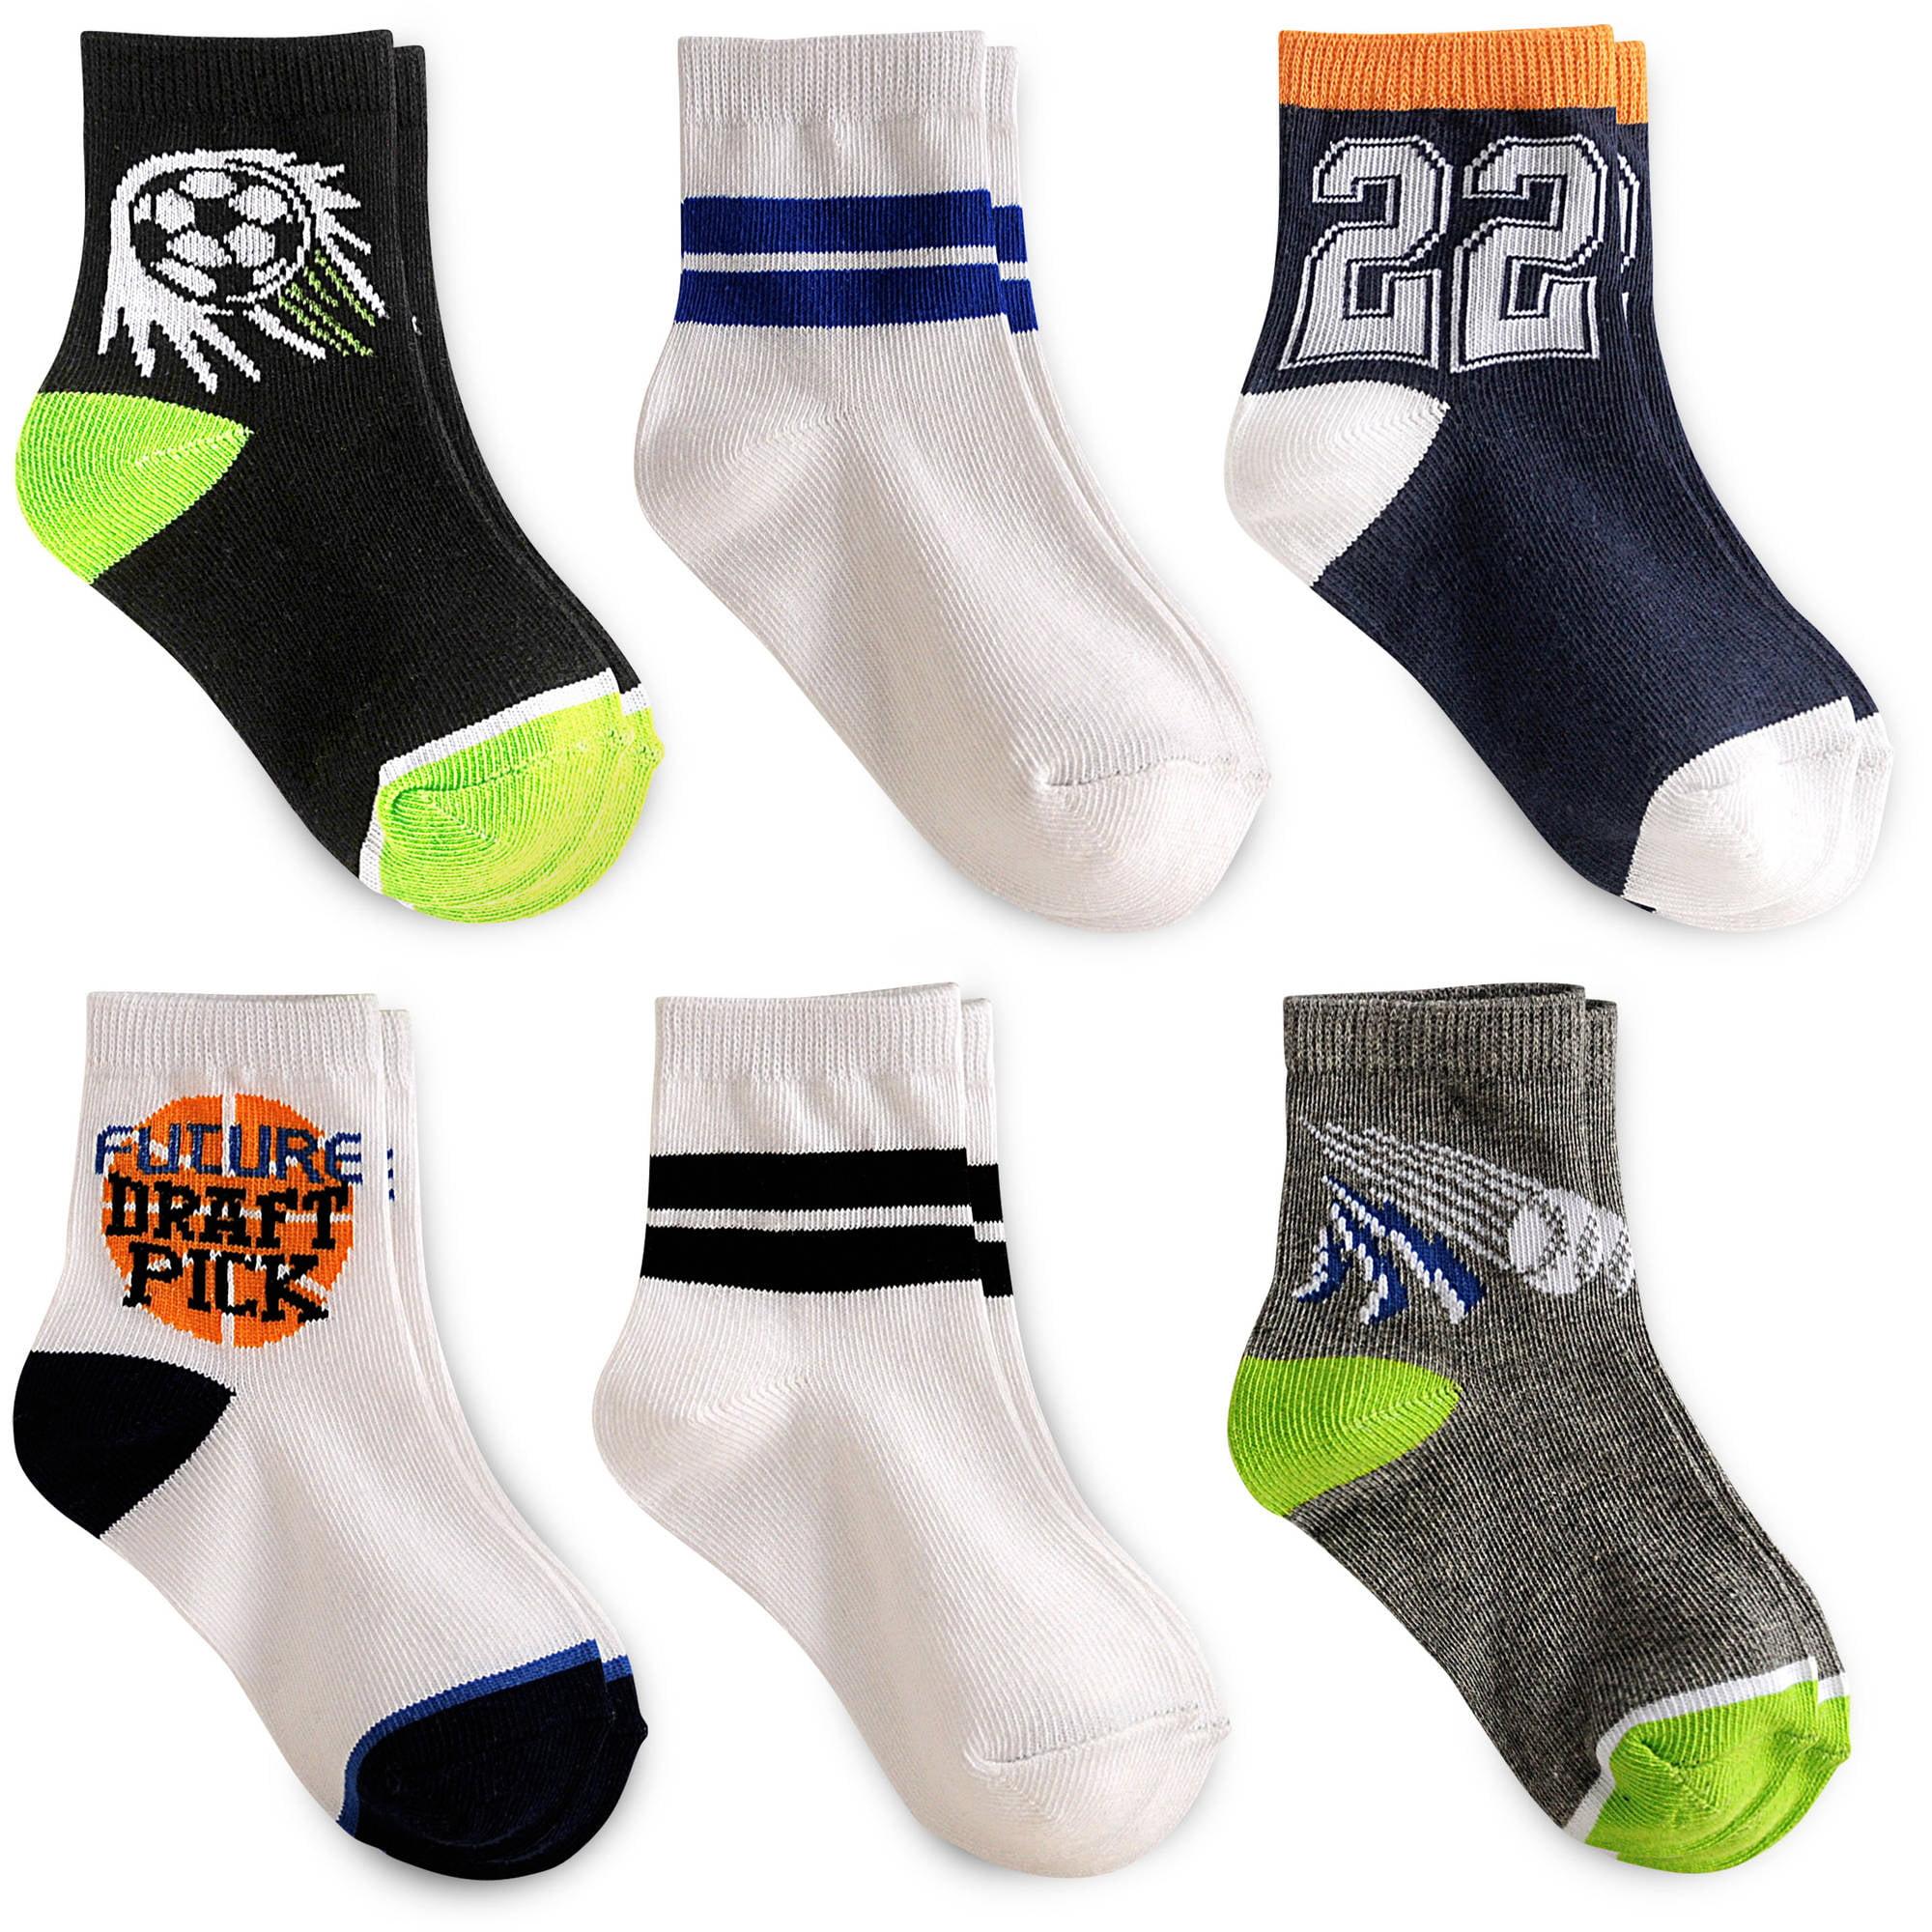 Garanimals Baby Toddler Boy Sports Crew Socks, 6-Pack